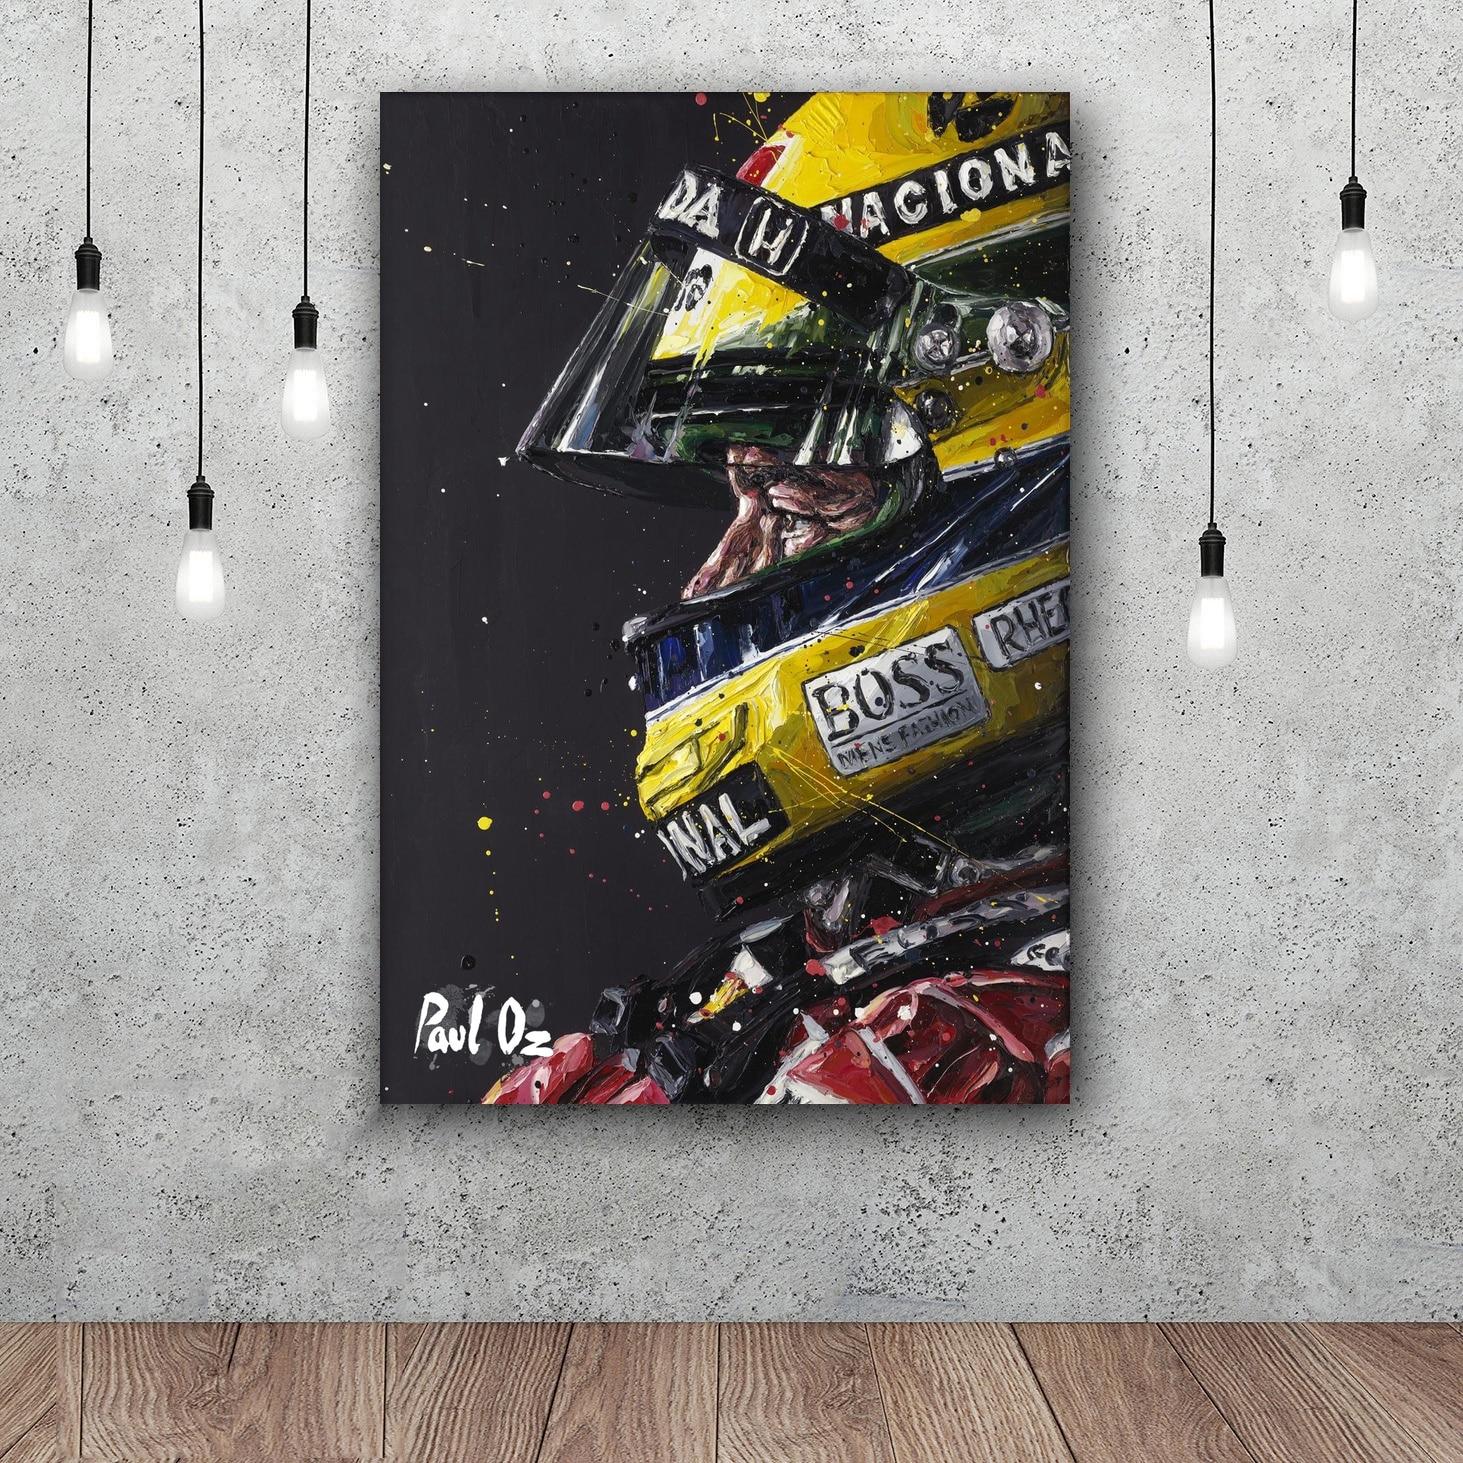 Ayrton Senna Da Silva F1 Racer At The Disco Art Silk Fabric Poster Wall Decor 12x18 24x36Inch